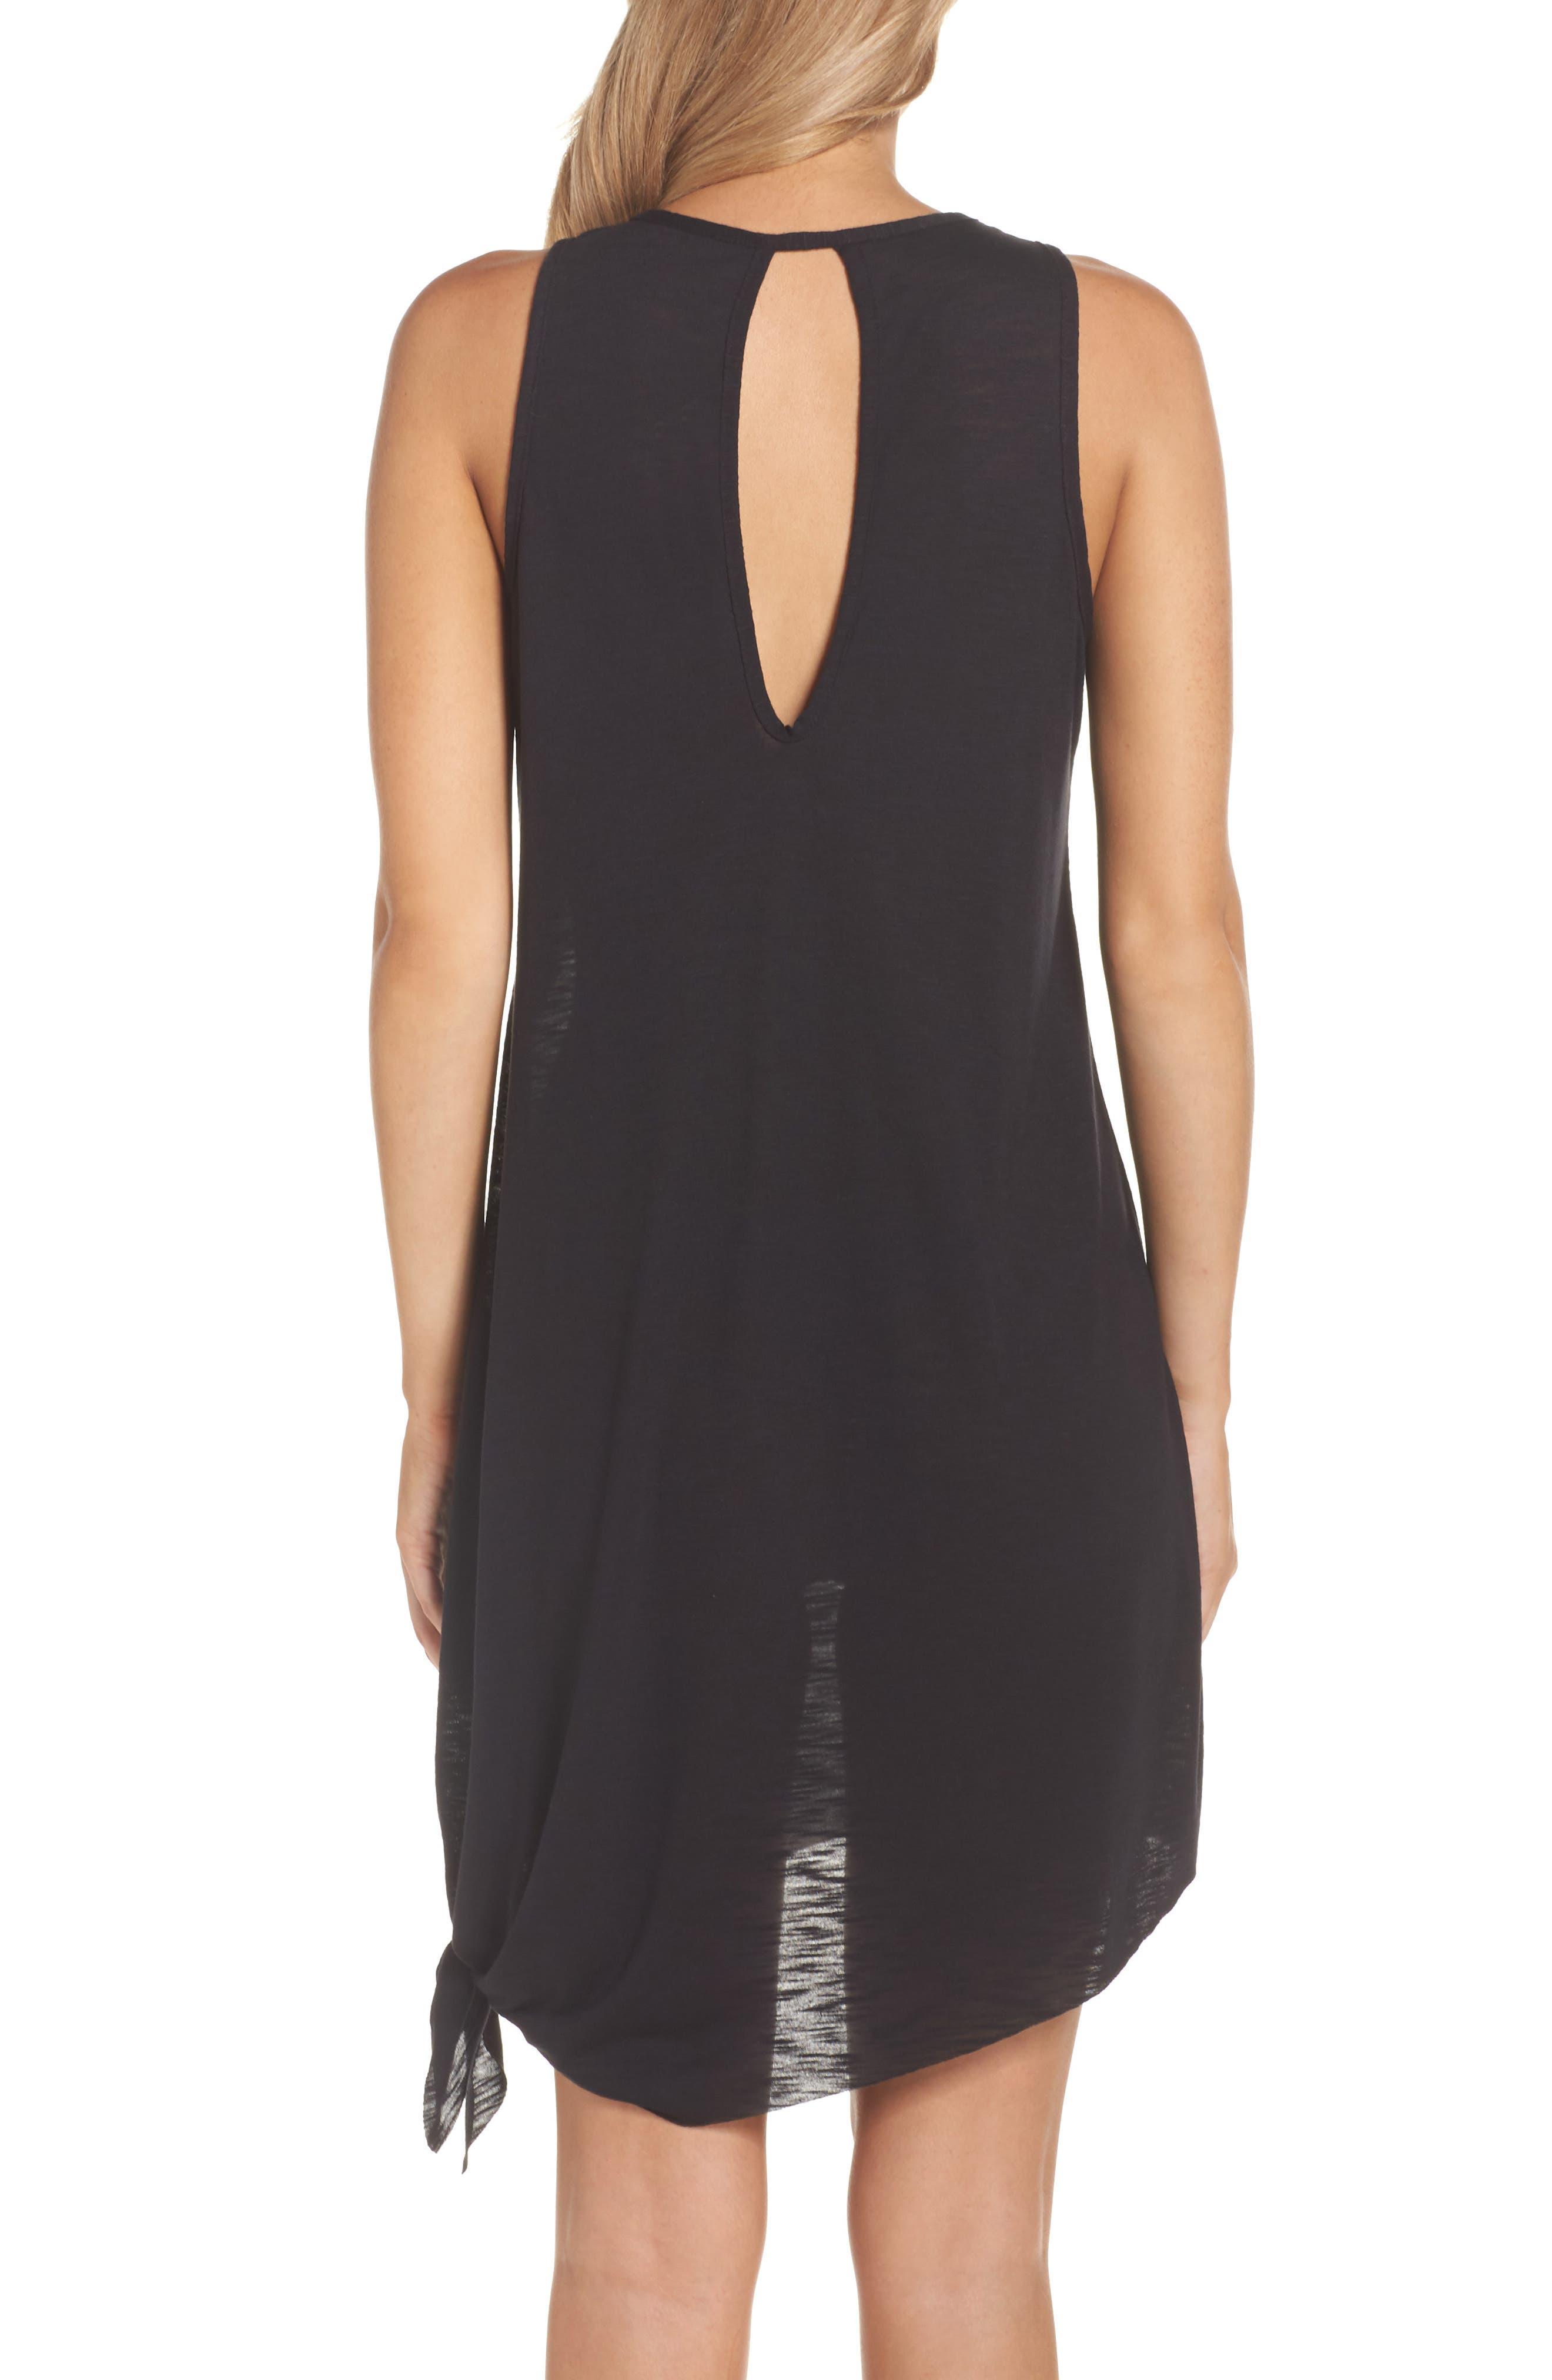 BECCA, Breezy Basics Cover-Up Dress, Alternate thumbnail 2, color, BLACK